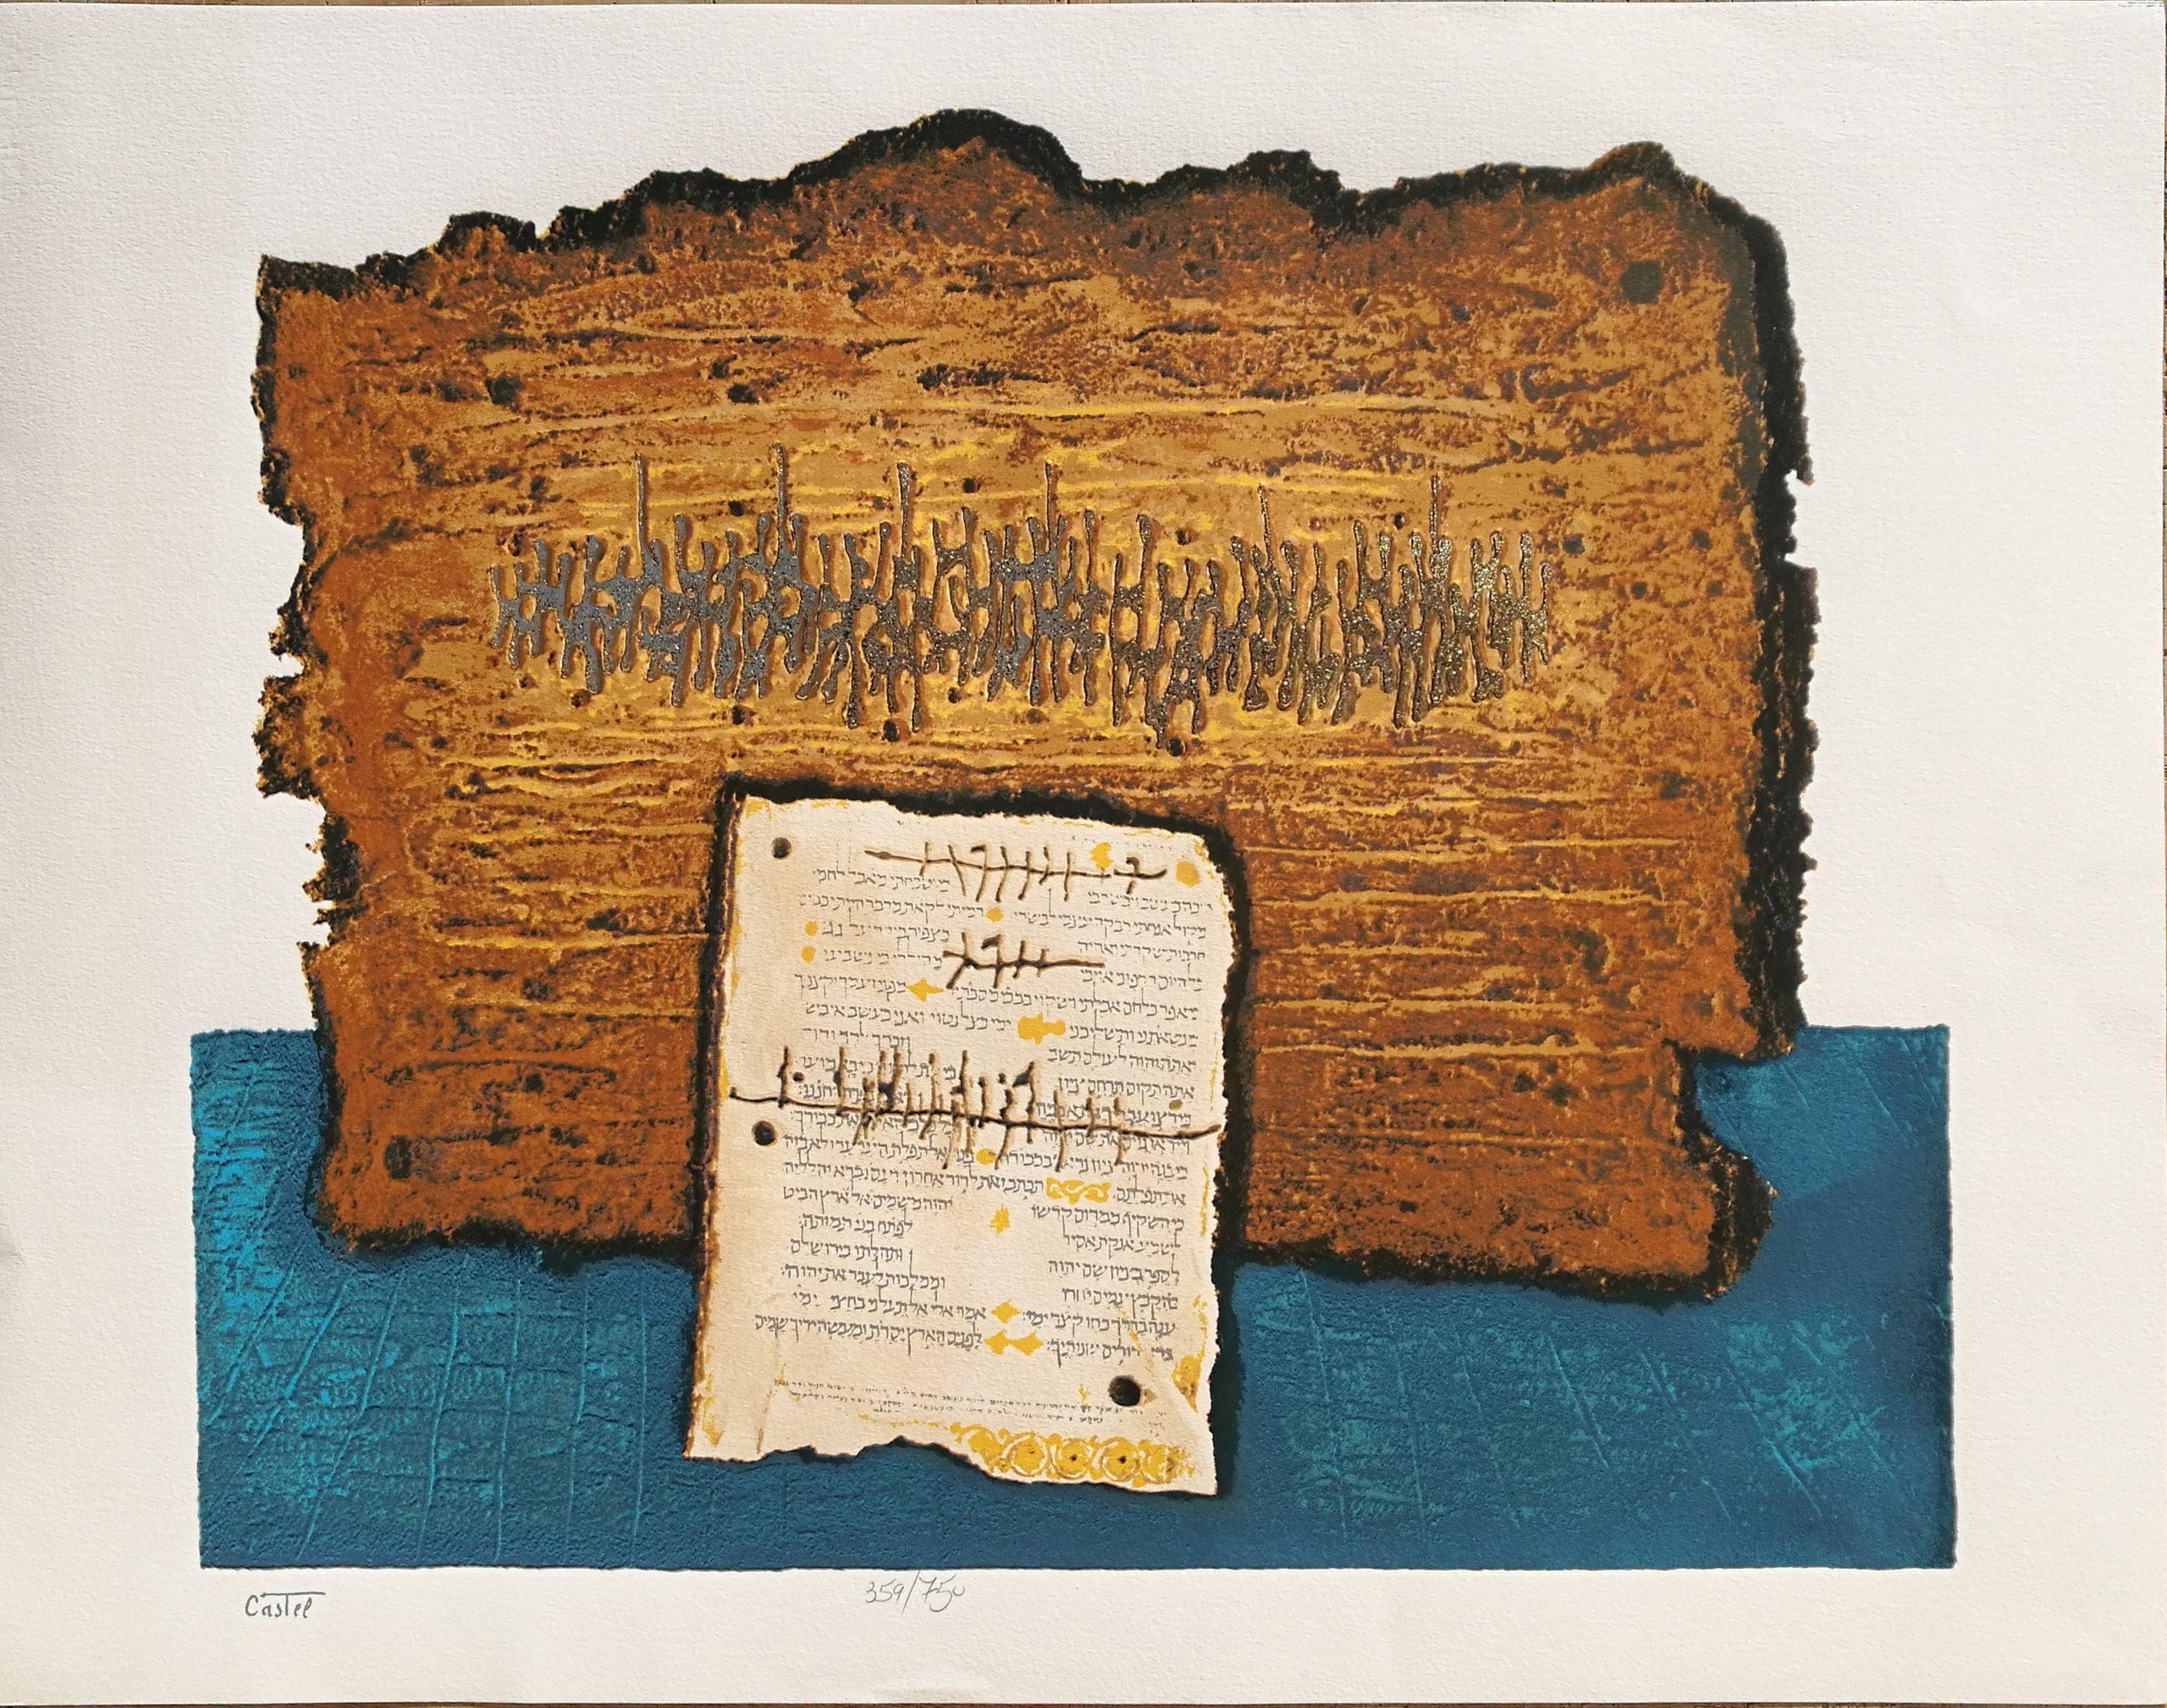 Psalms by Moshe Castel